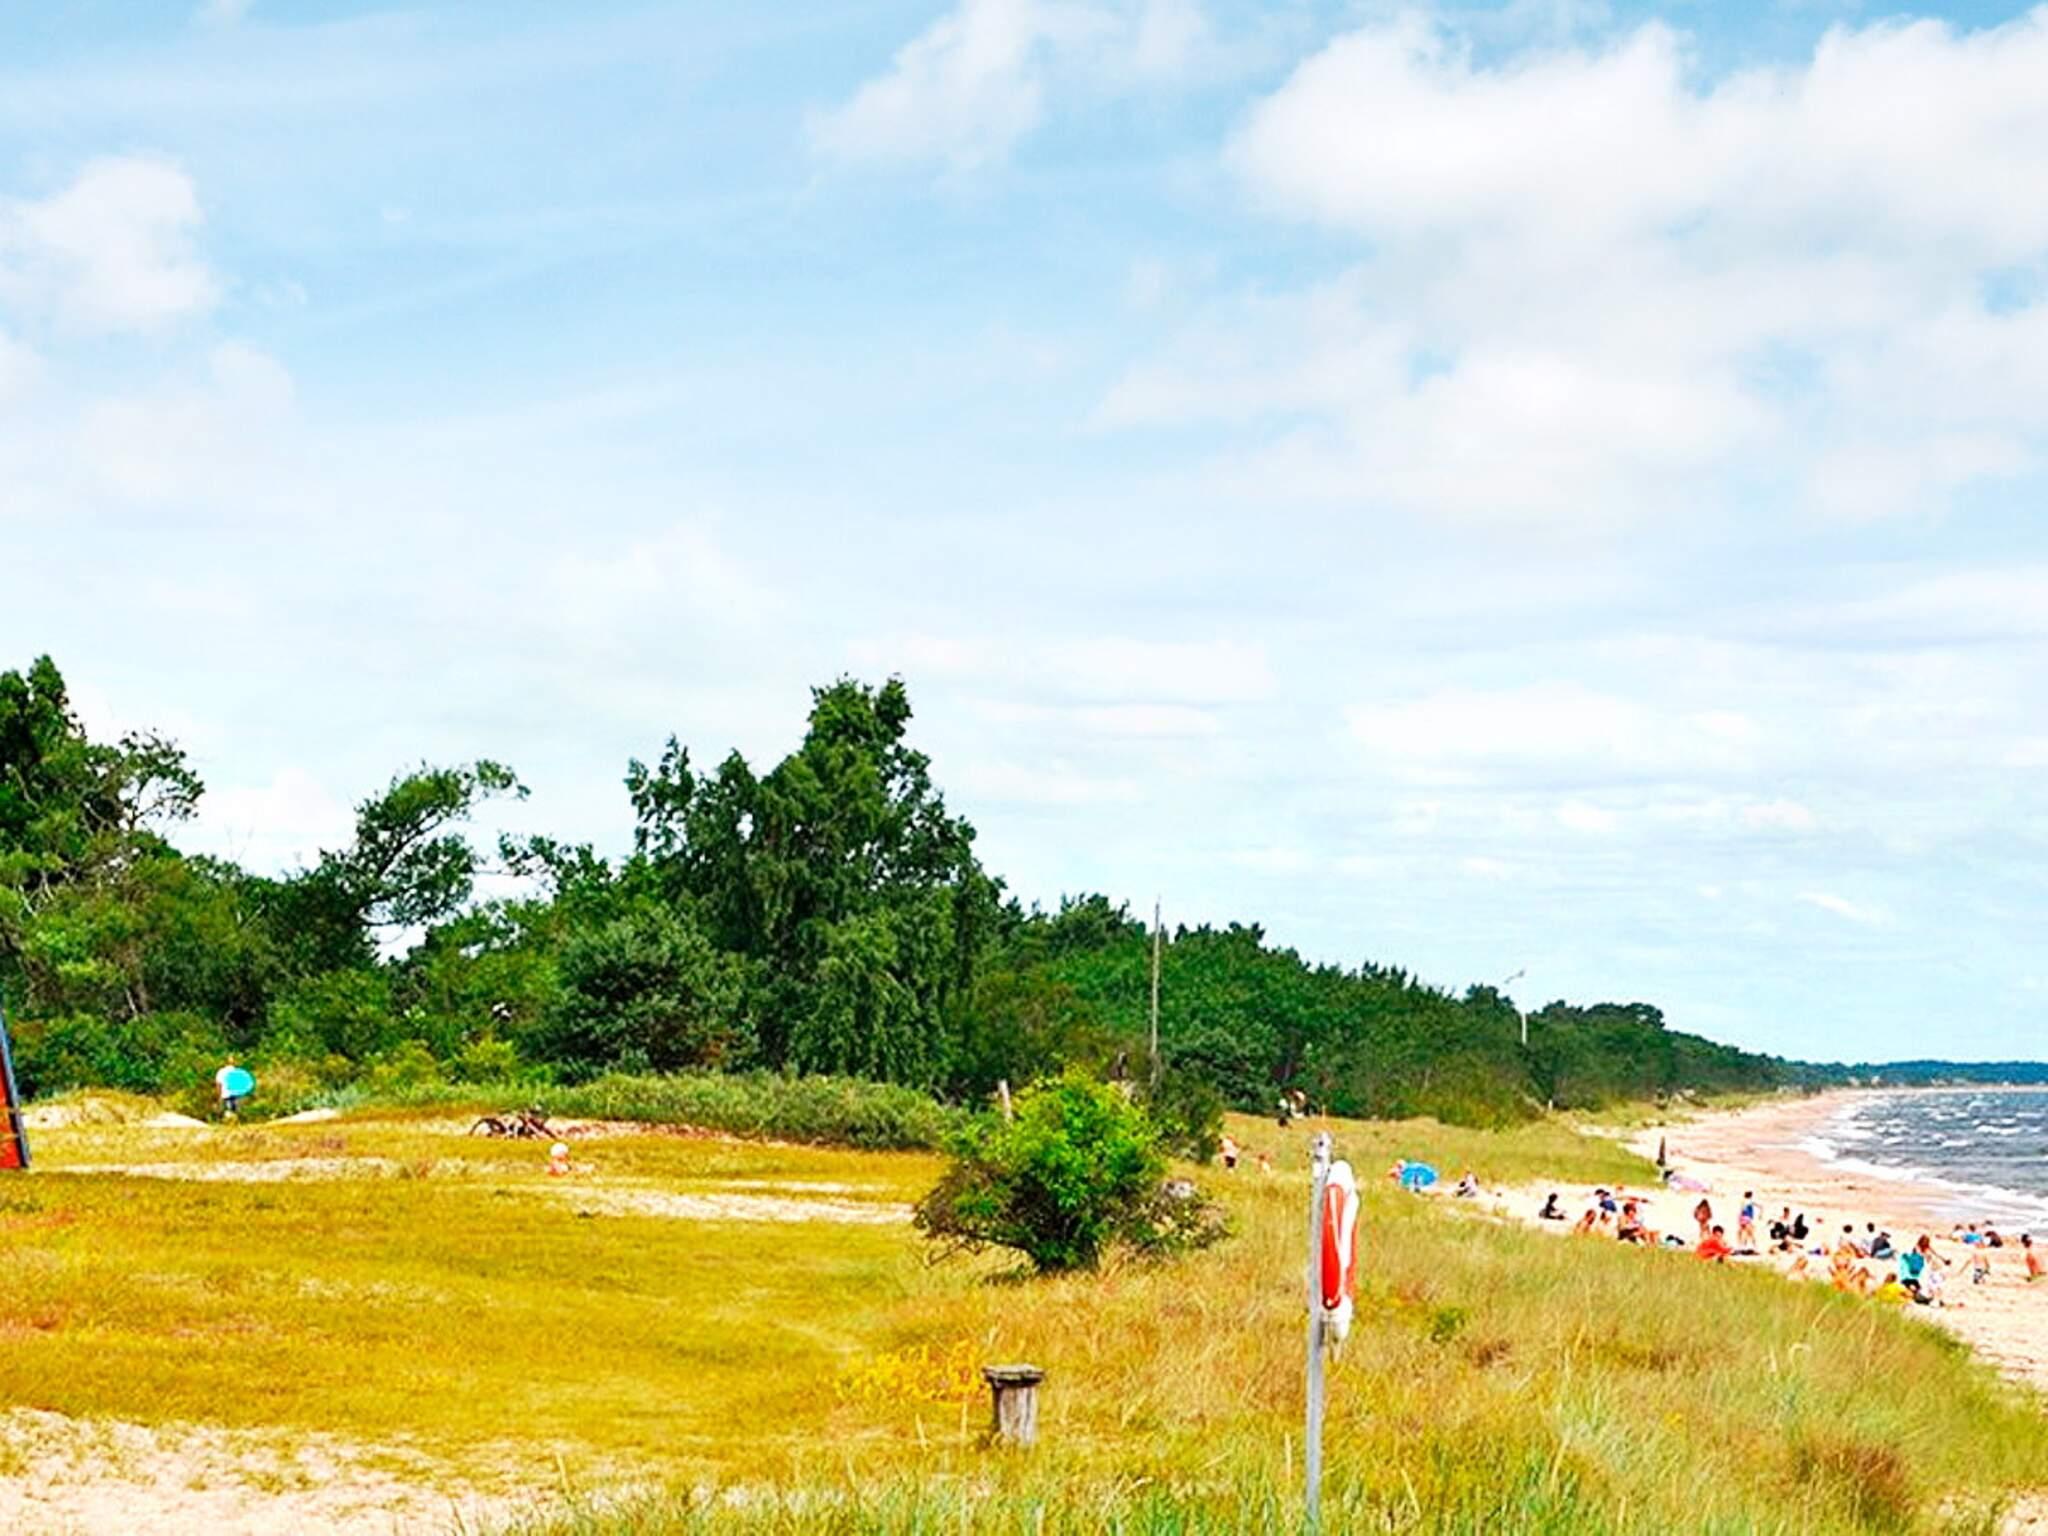 Ferienhaus Degeberga (2624324), Degeberga, Skane län, Südschweden, Schweden, Bild 15